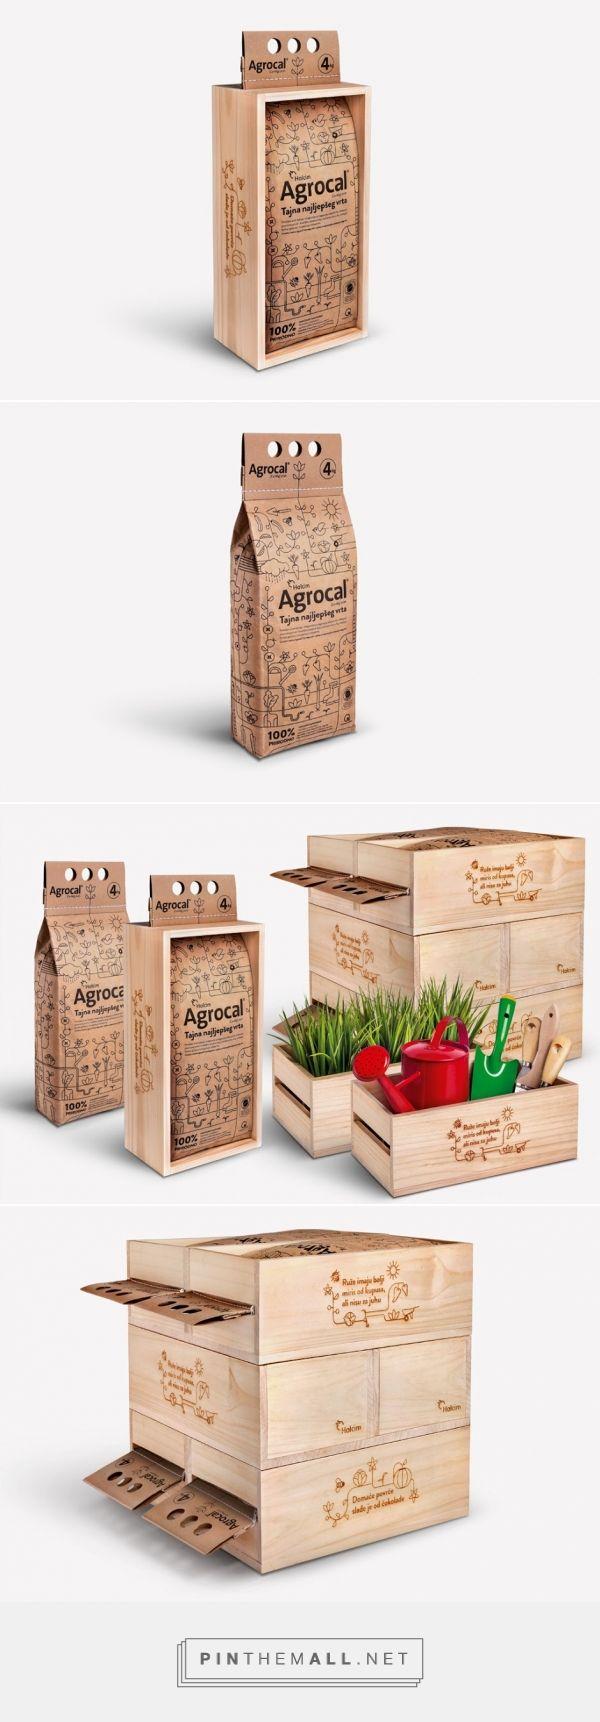 Holcim Agrocal powder gardening packaging design by Studio Sonda (Croatia) - http://www.packagingoftheworld.com/2016/04/holcim-agrocal.html - created via https://pinthemall.net